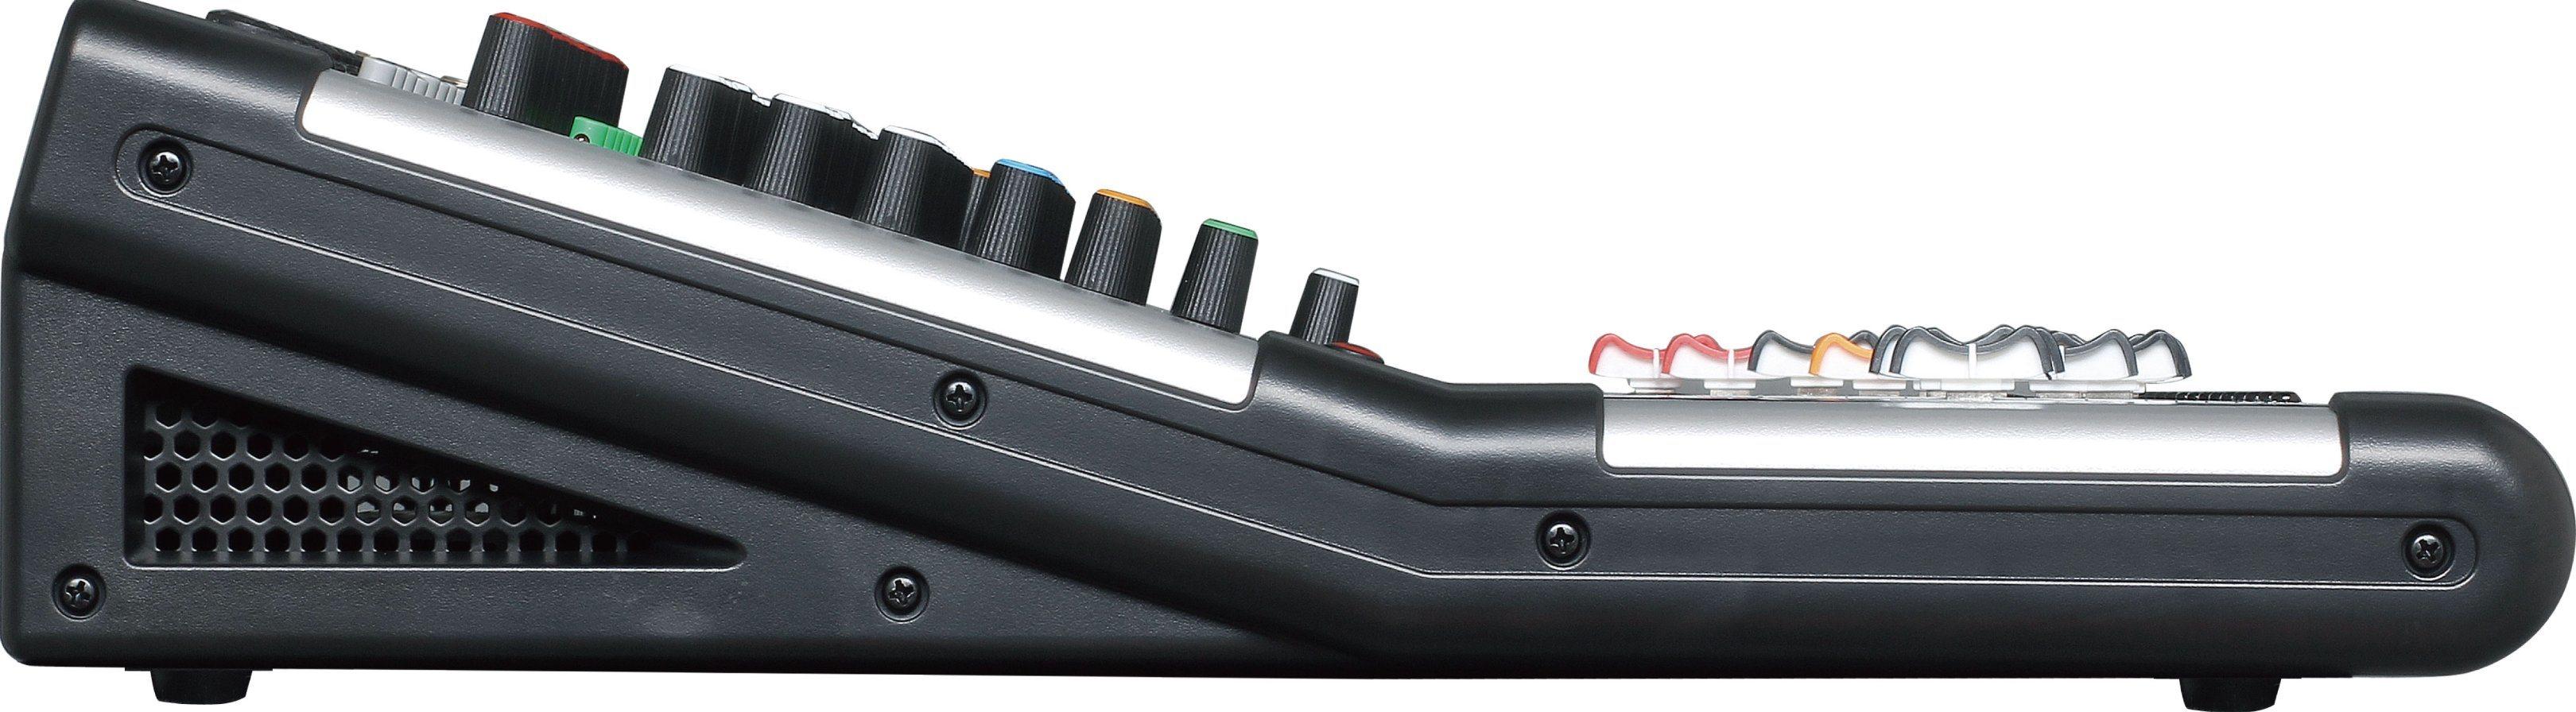 Special New Design Mixer Gl Series Professional Amplifier